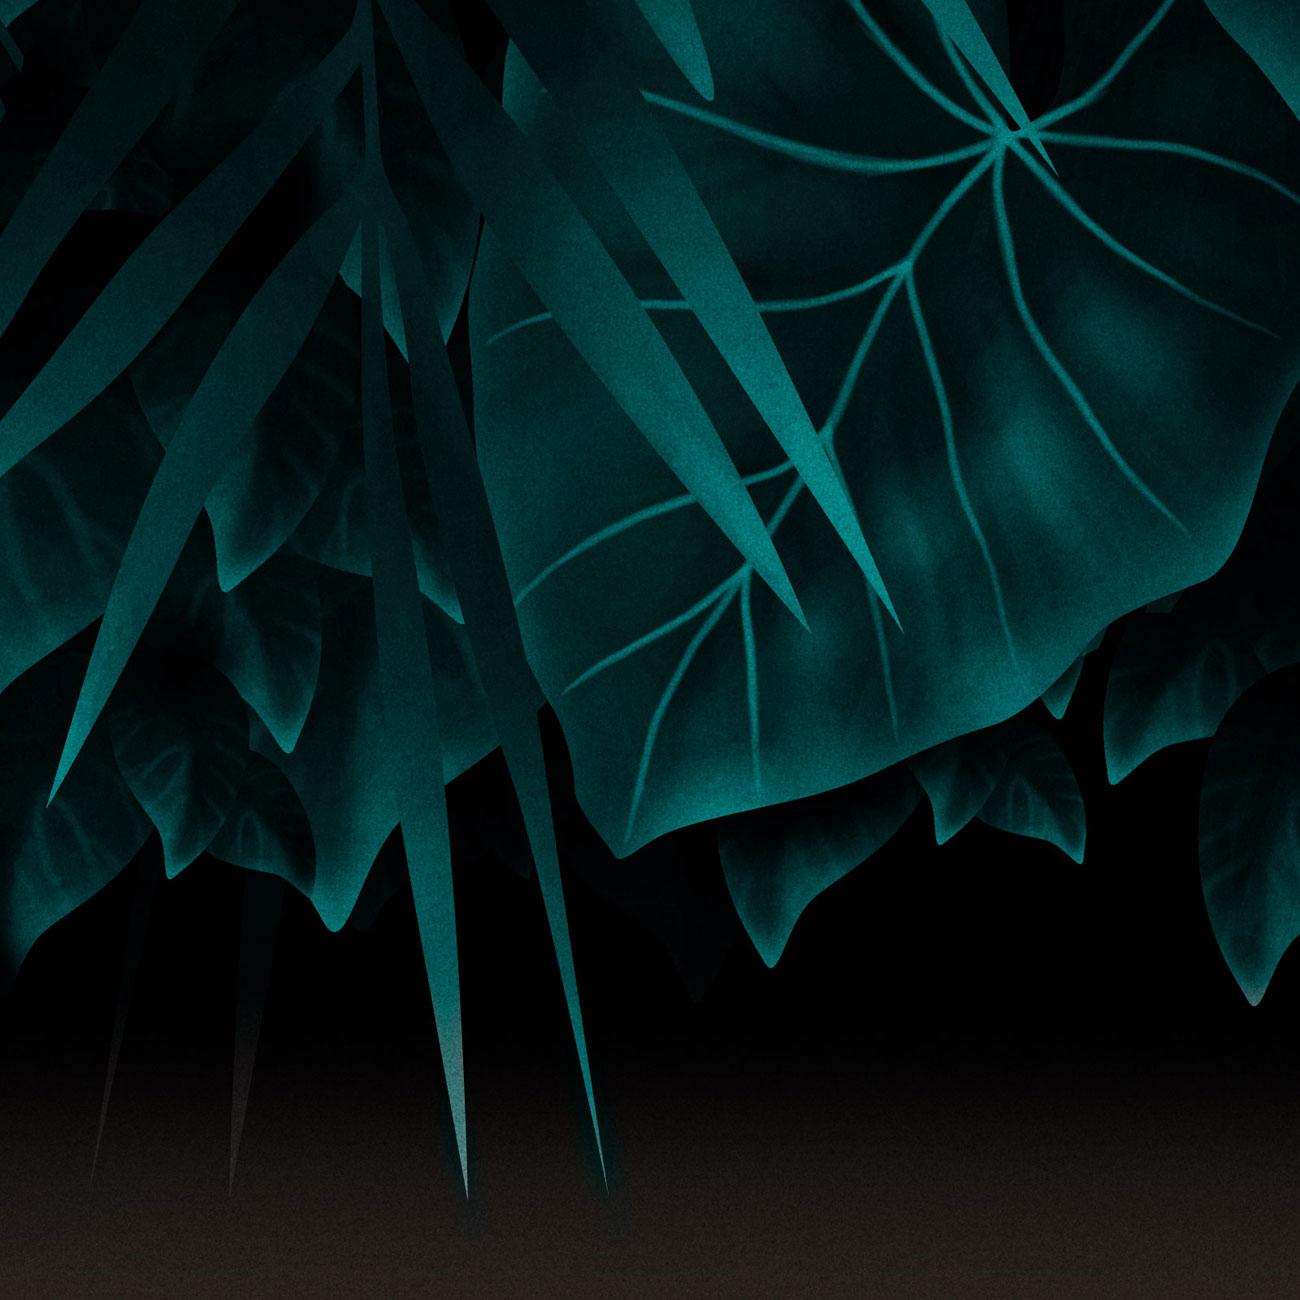 MidnightSwim_Detail02.jpg